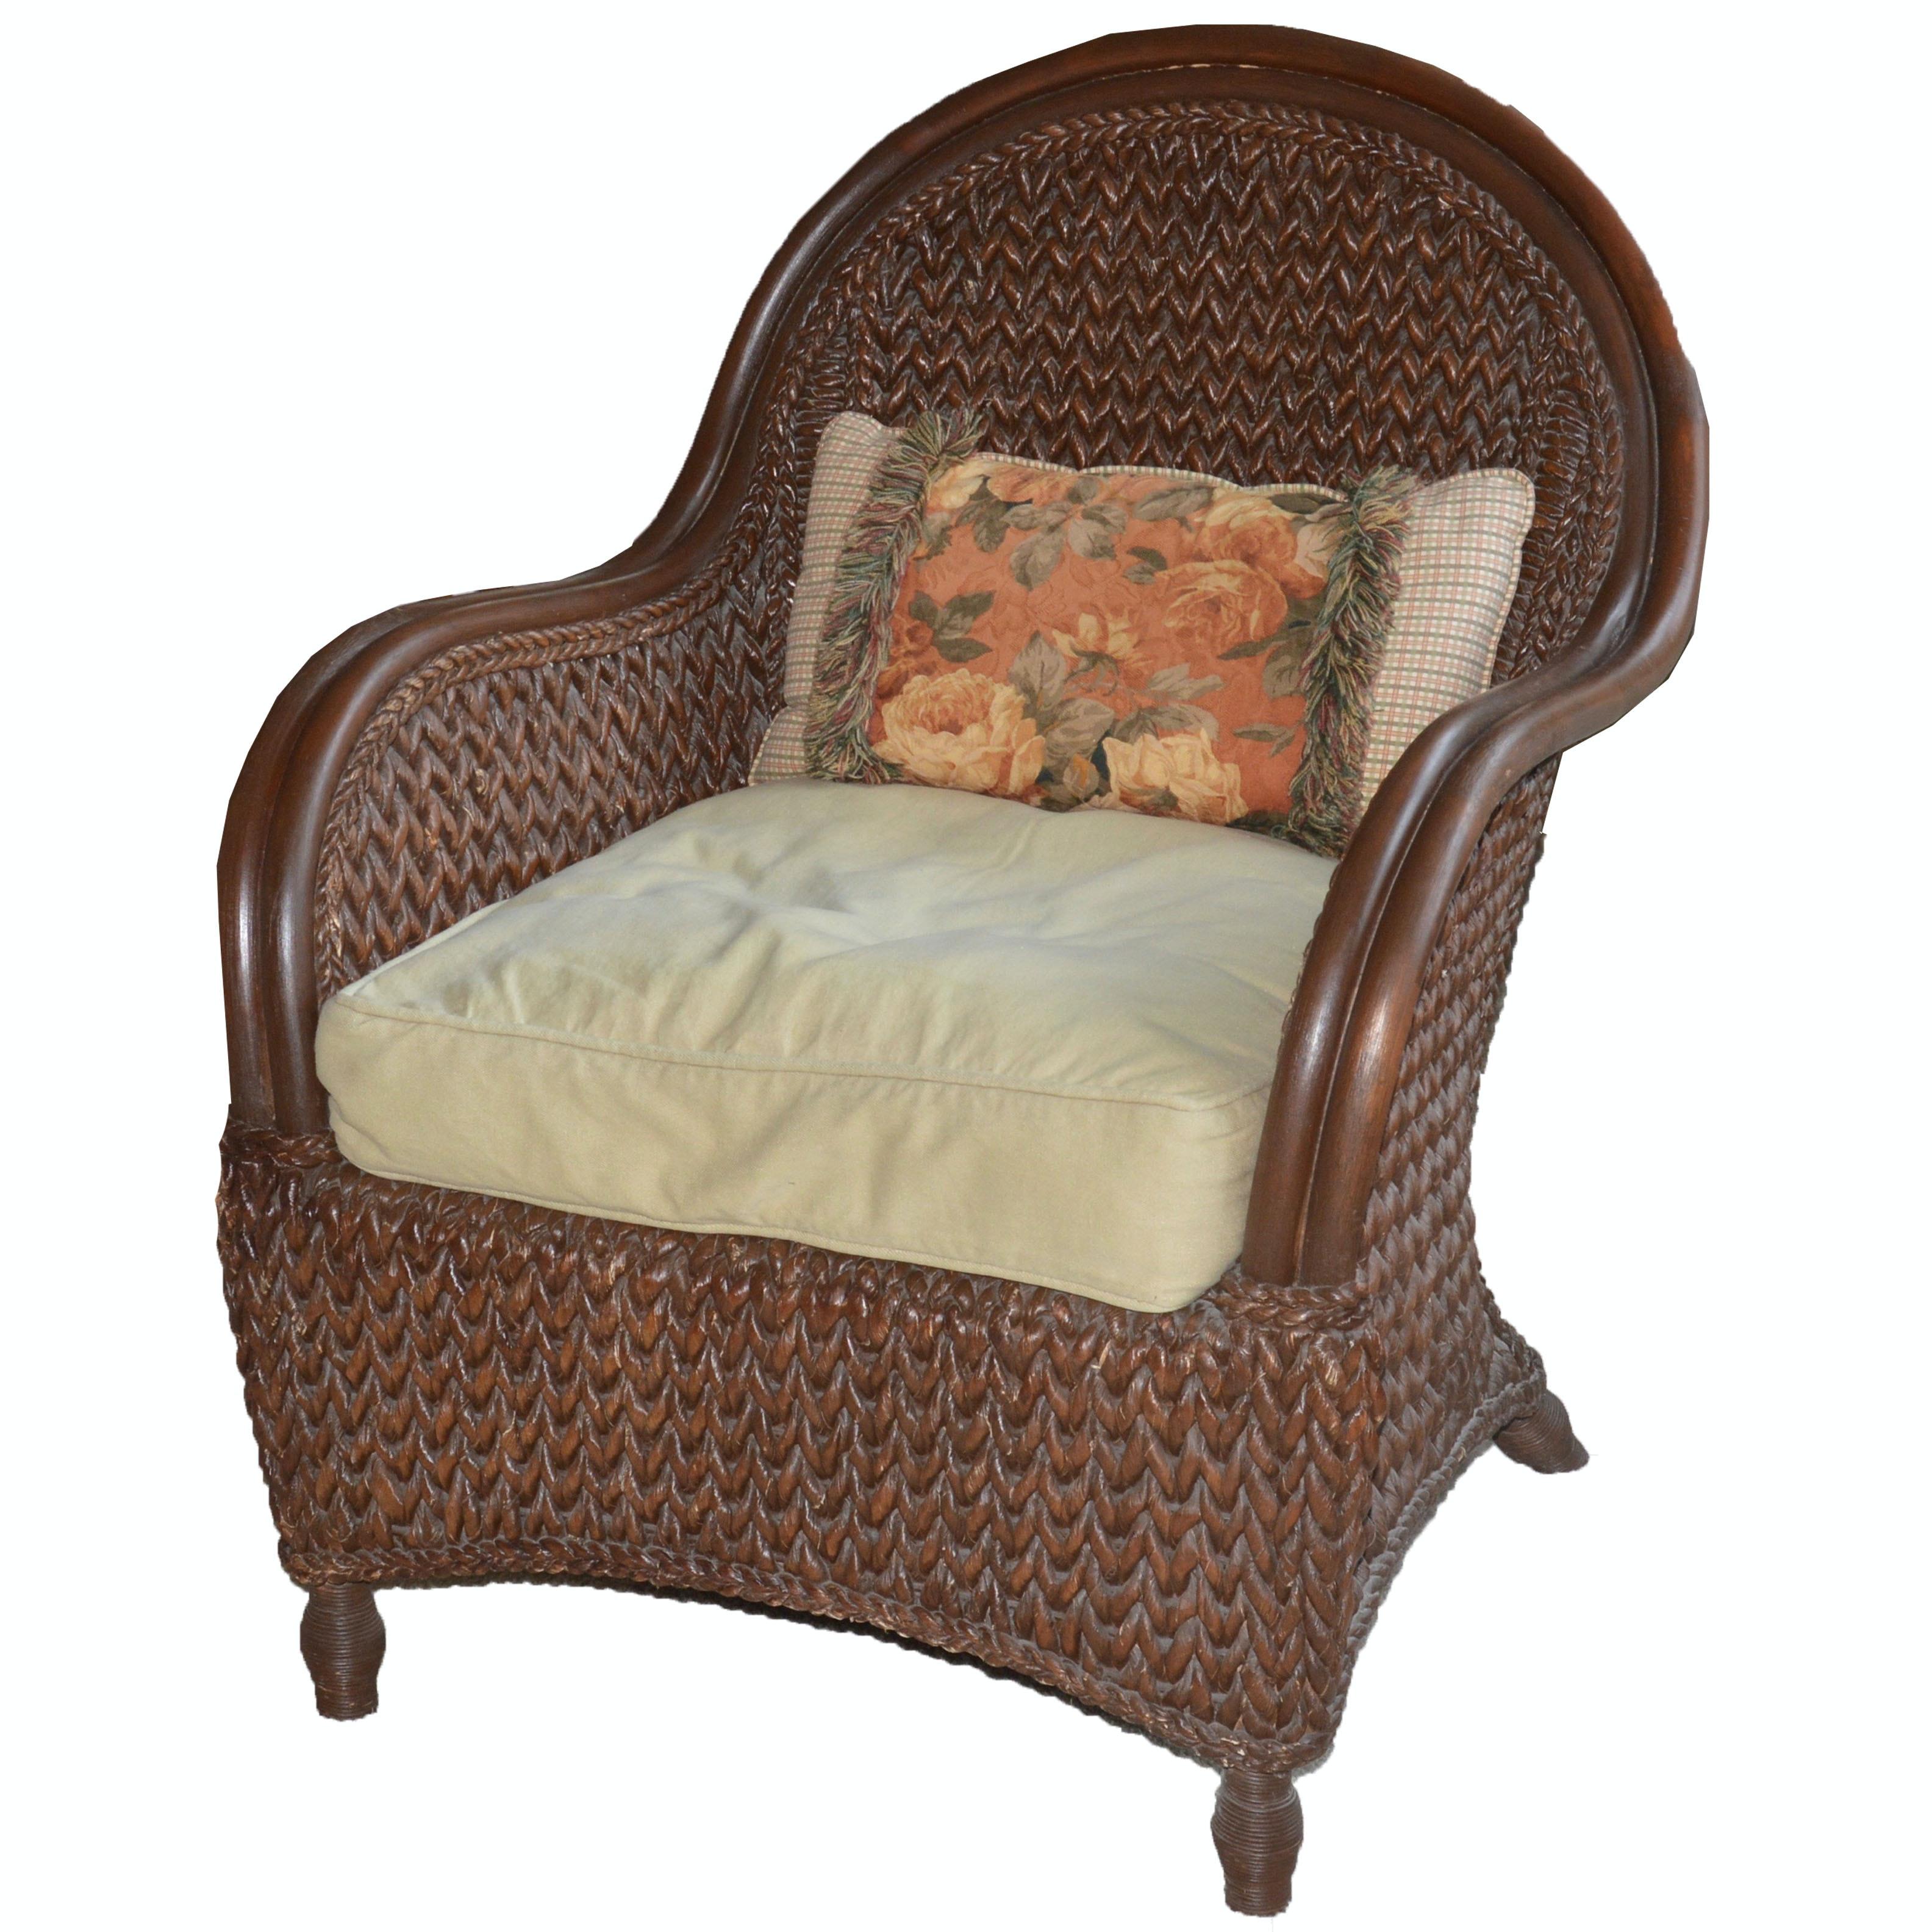 Brown Wicker Patio Armchair